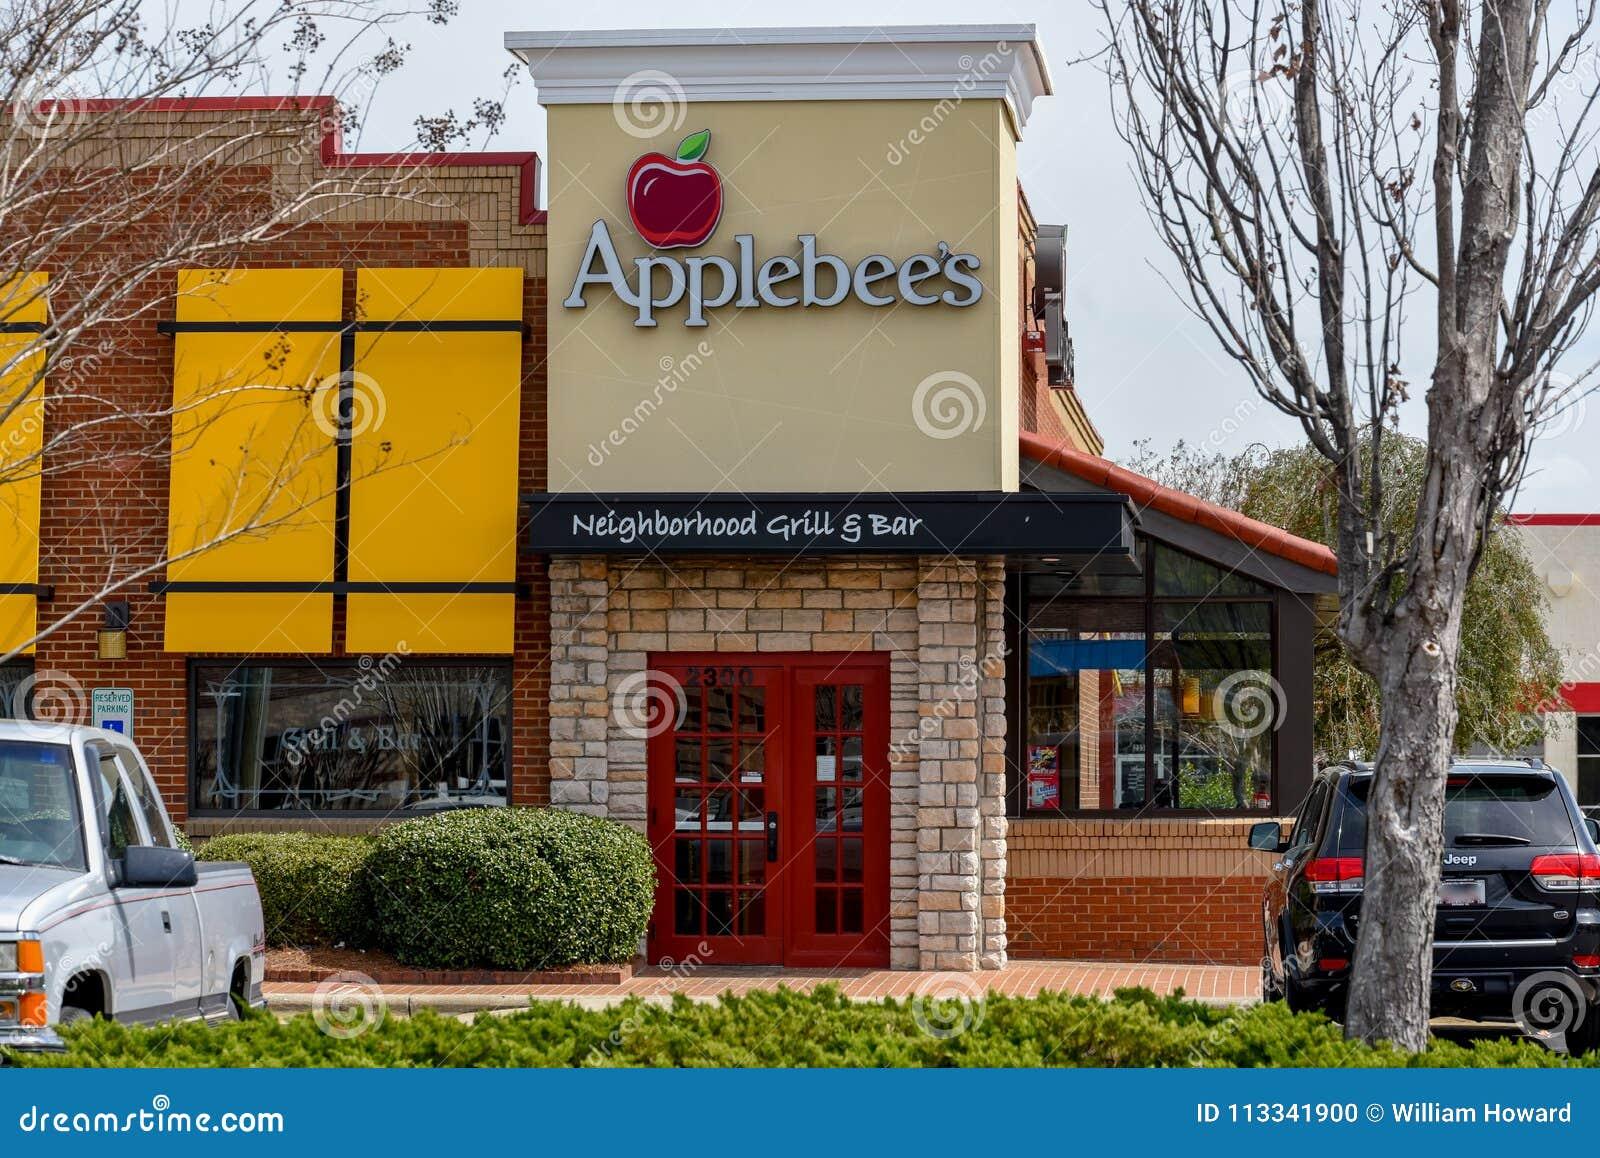 Applebee`s Neighborhood Grill and Bar location